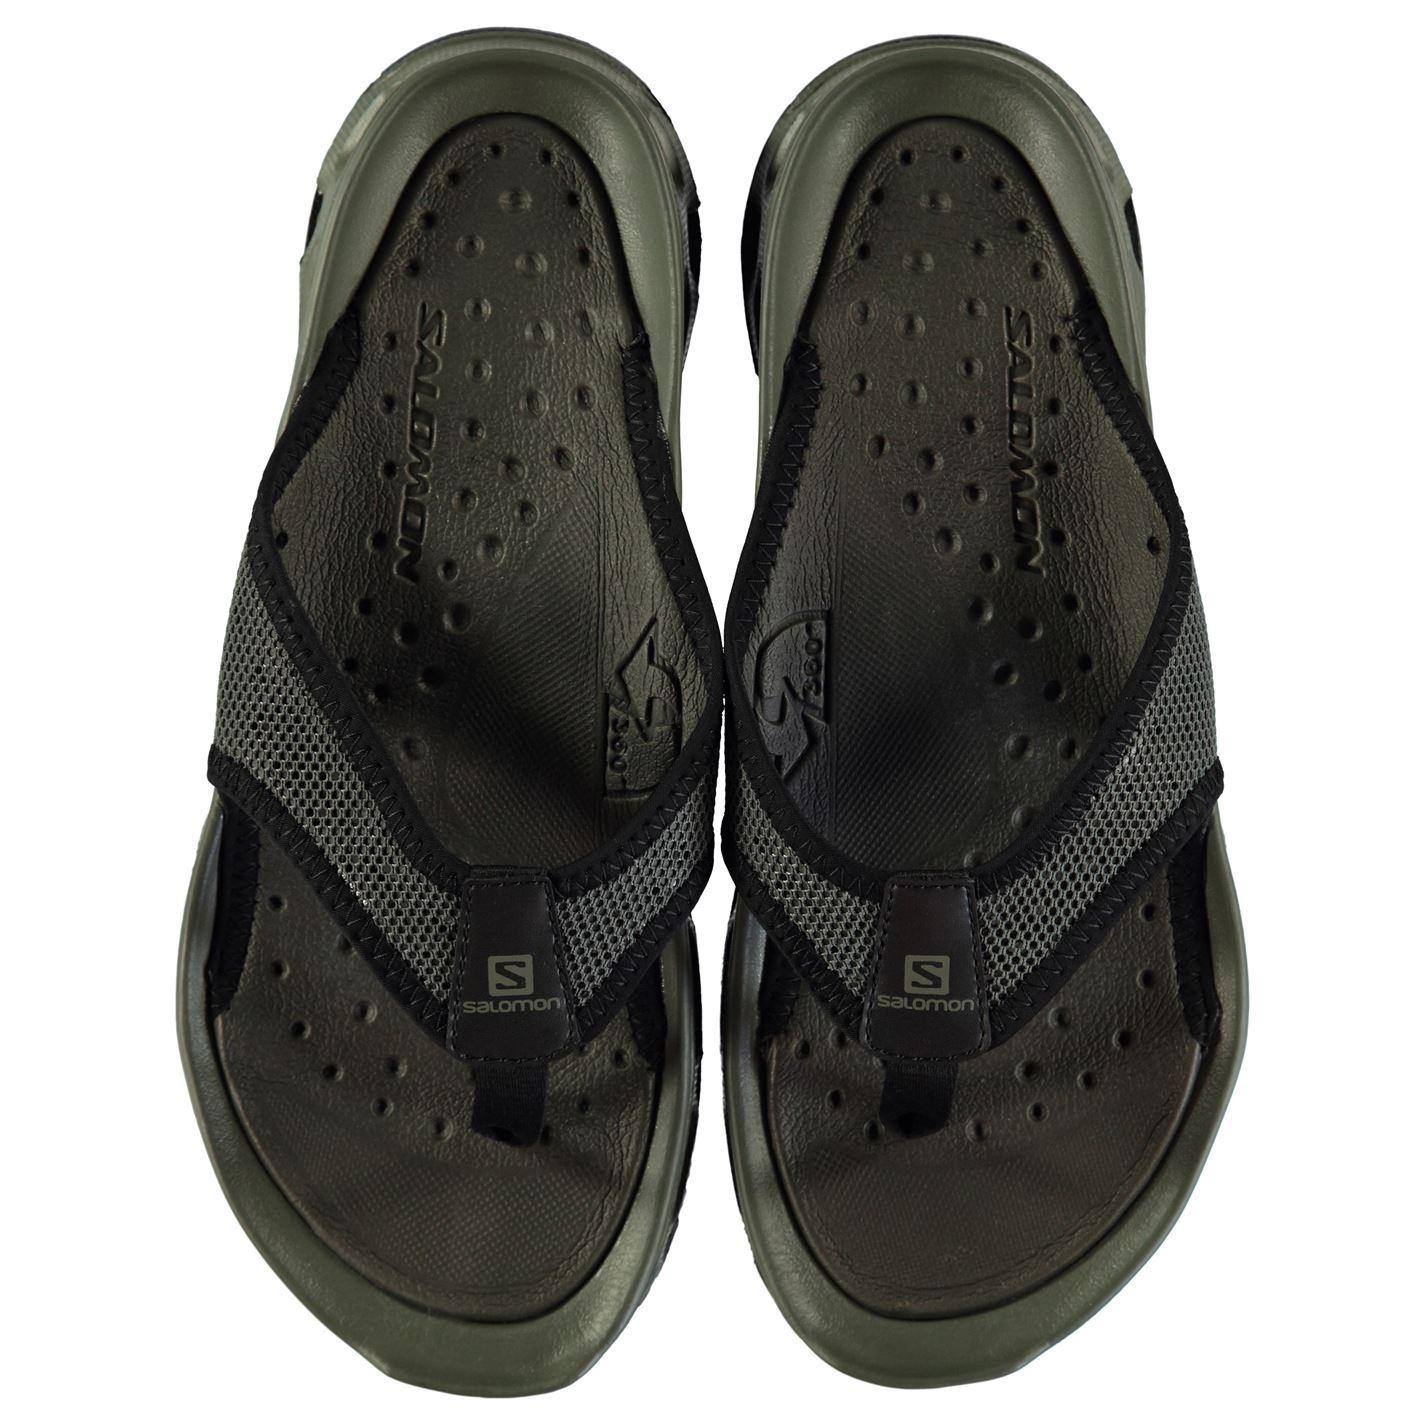 salomon rx slide mens sandals ireland